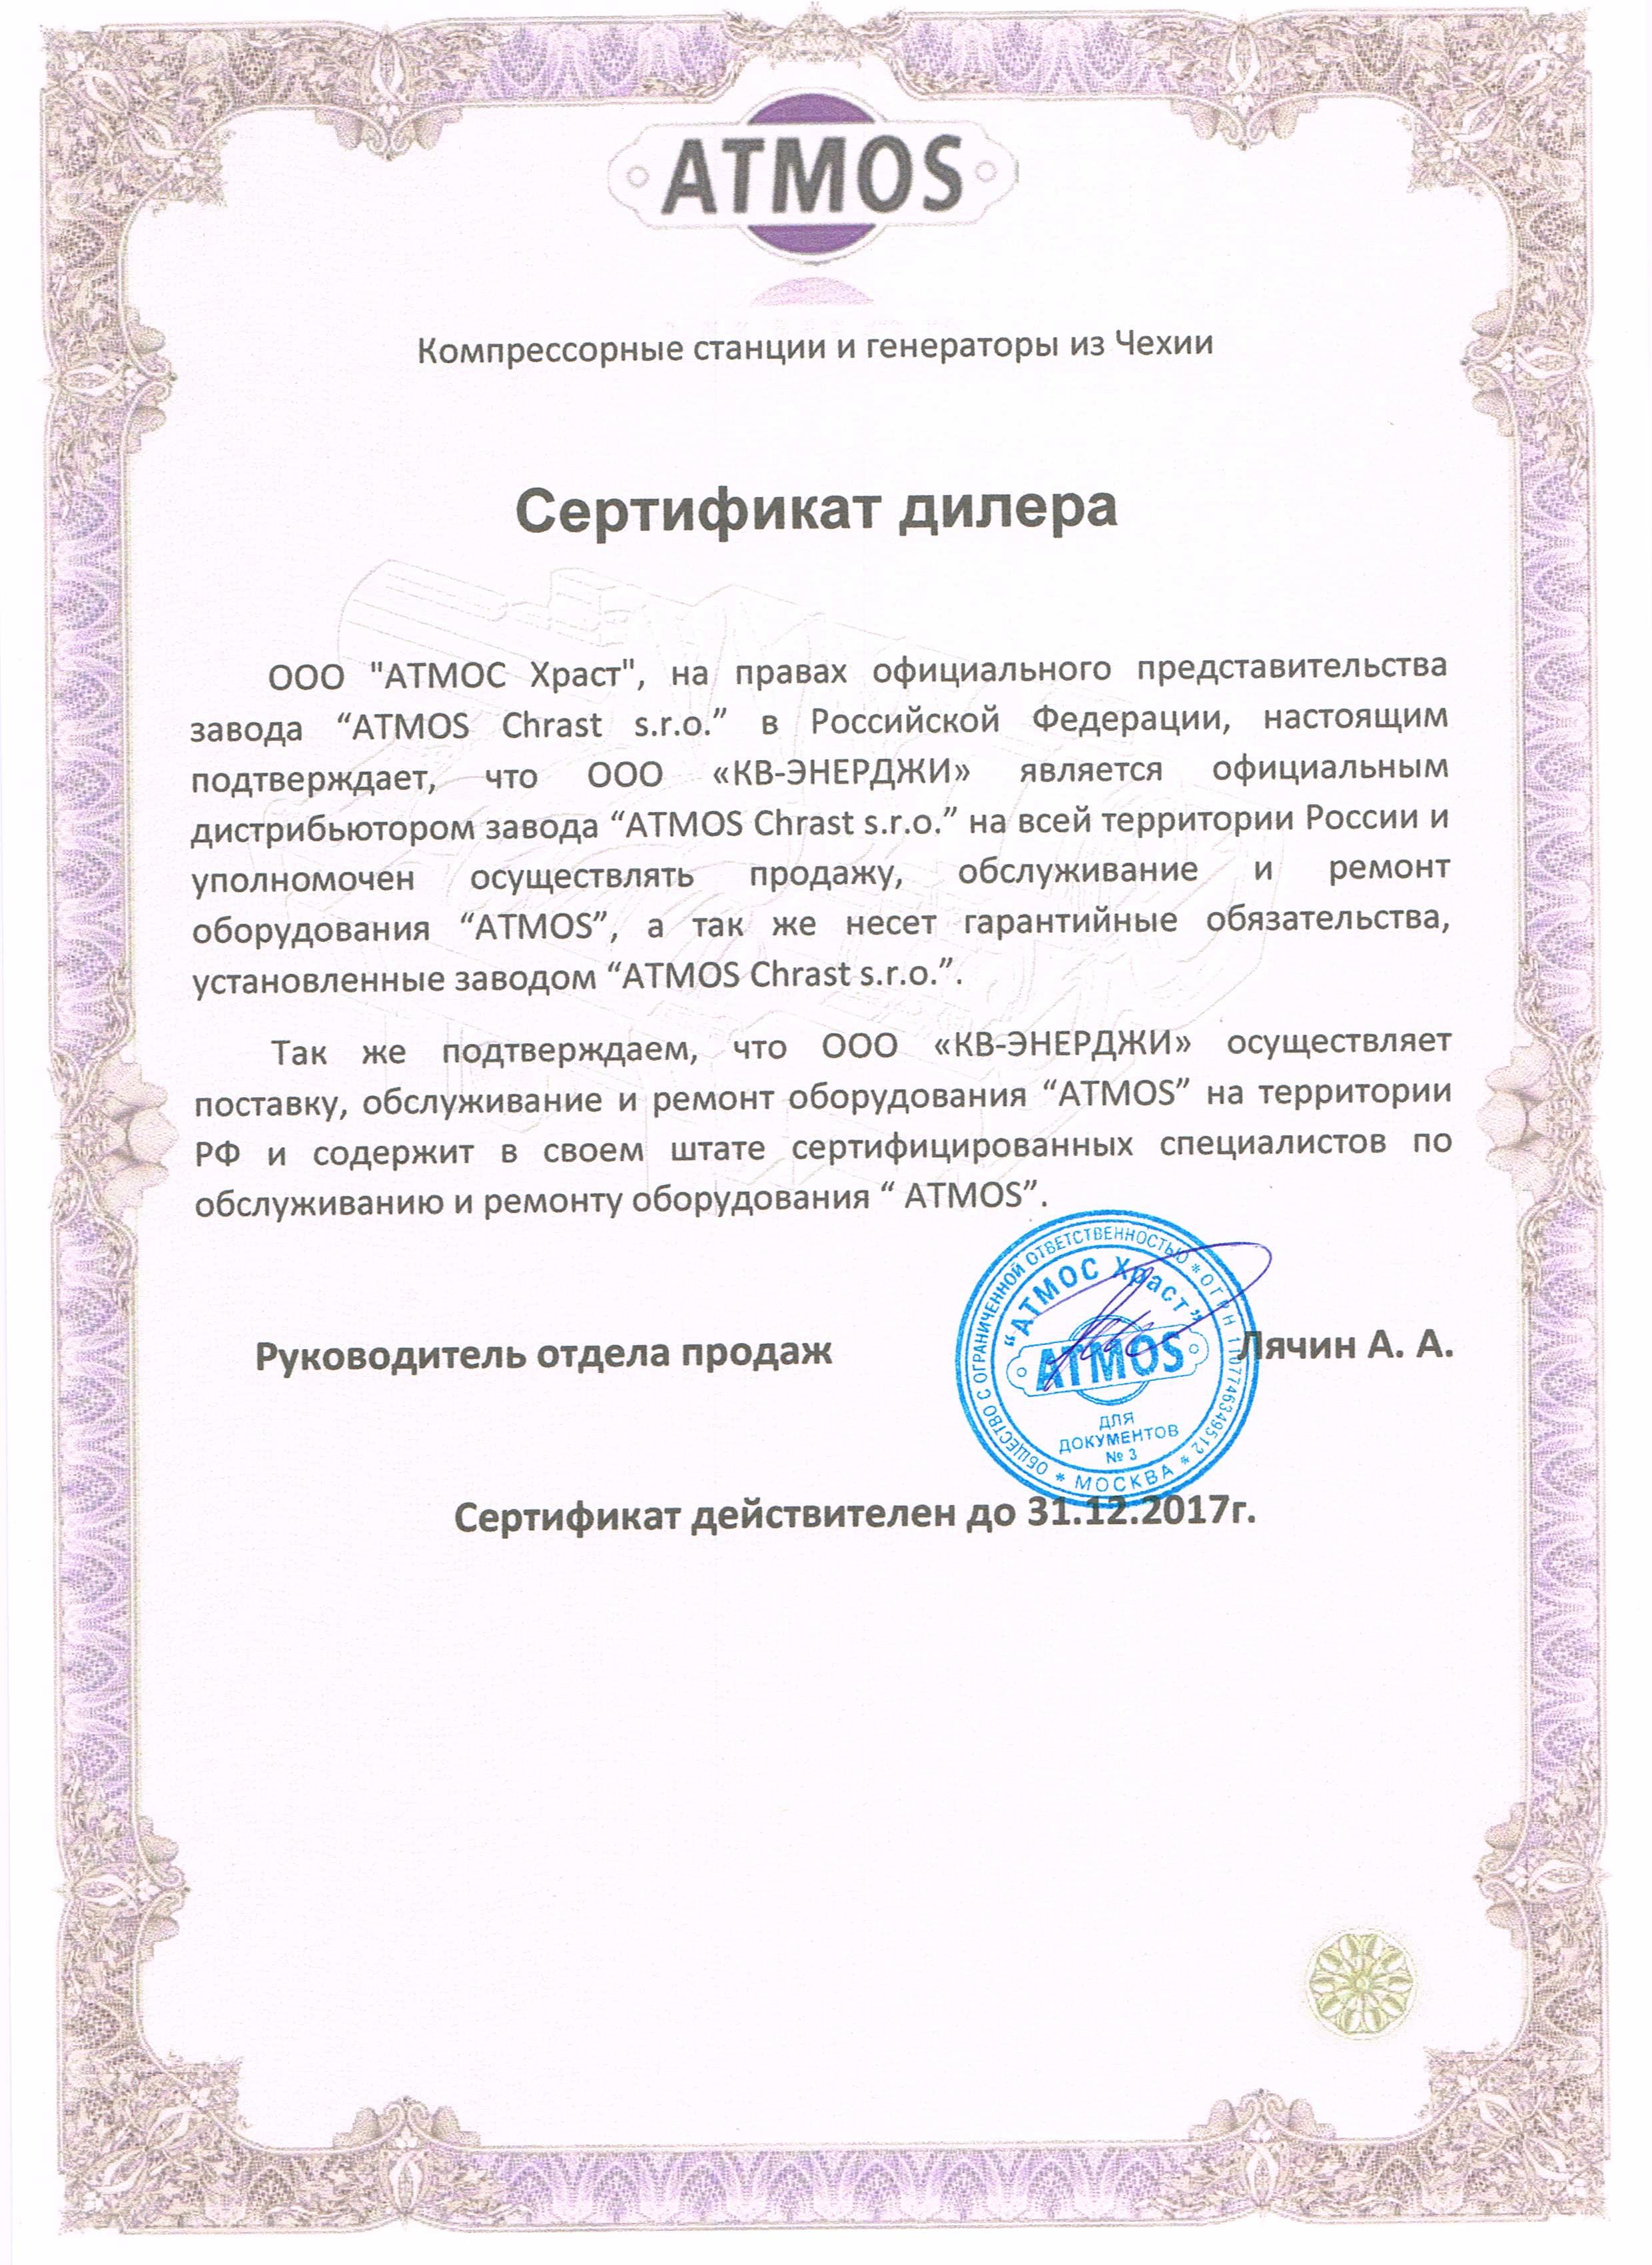 Atmos сертификат дилера